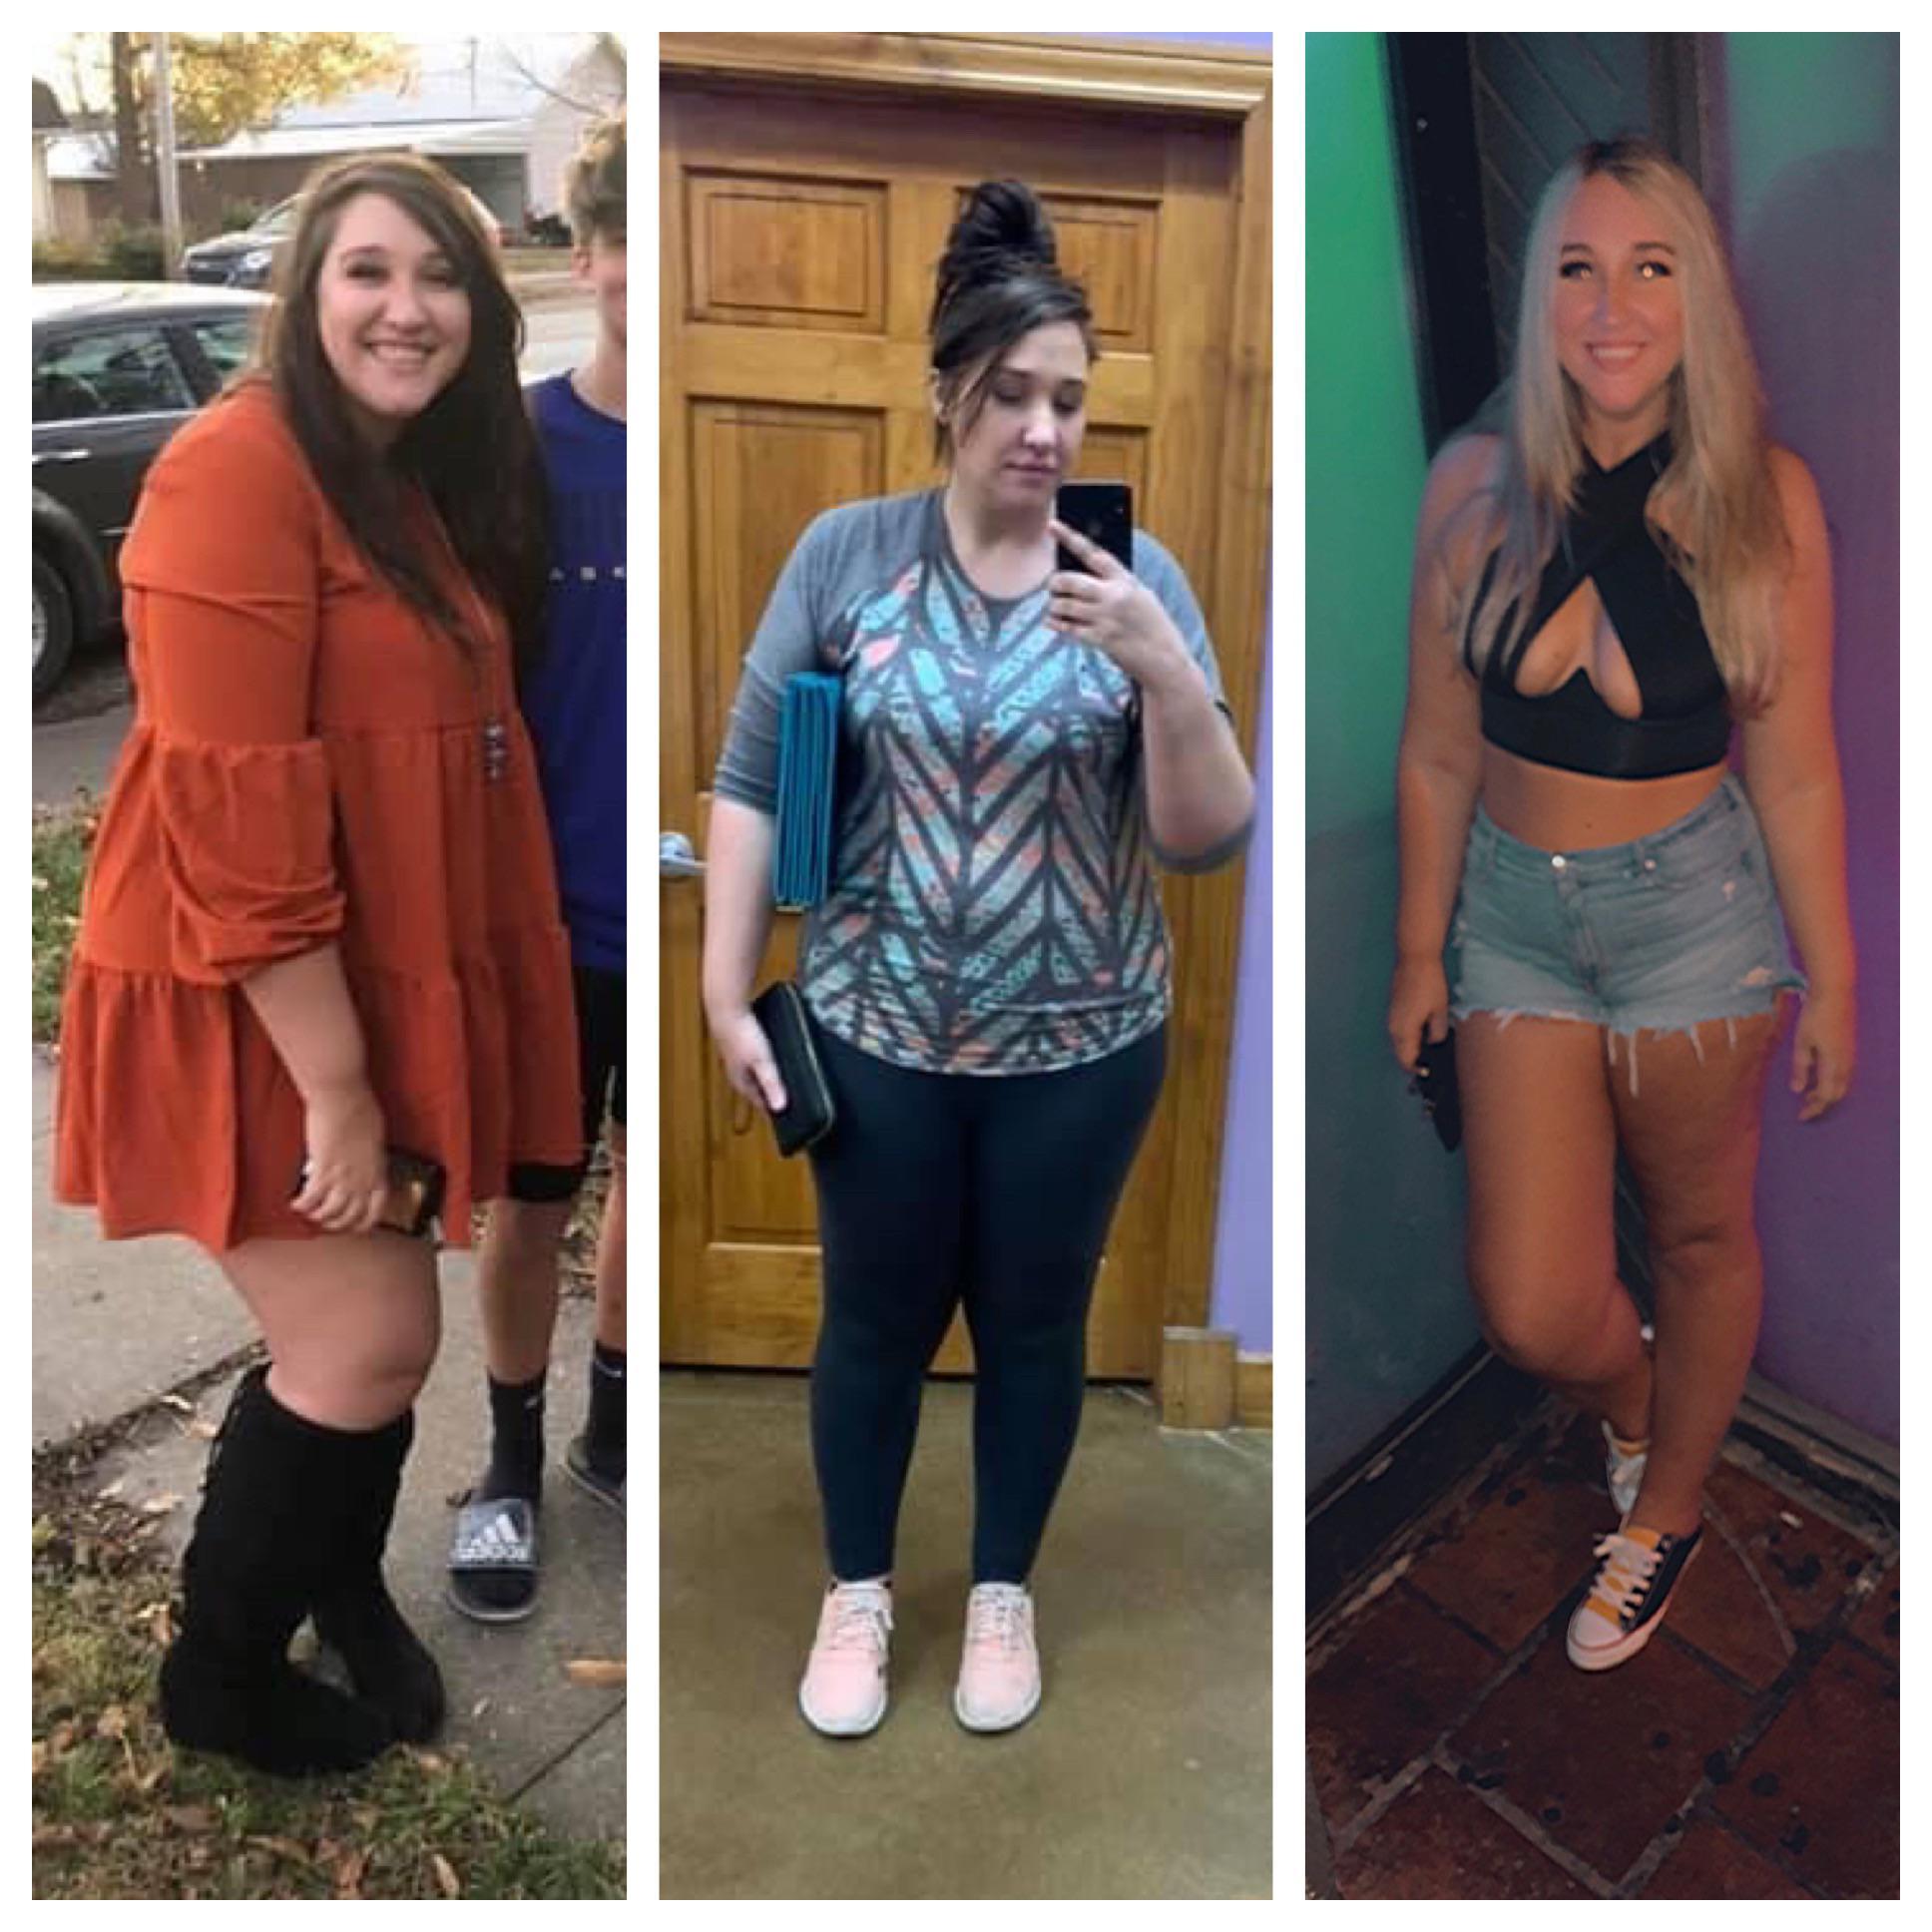 Progress Pics of 25 lbs Weight Loss 5 feet 11 Female 265 lbs to 240 lbs